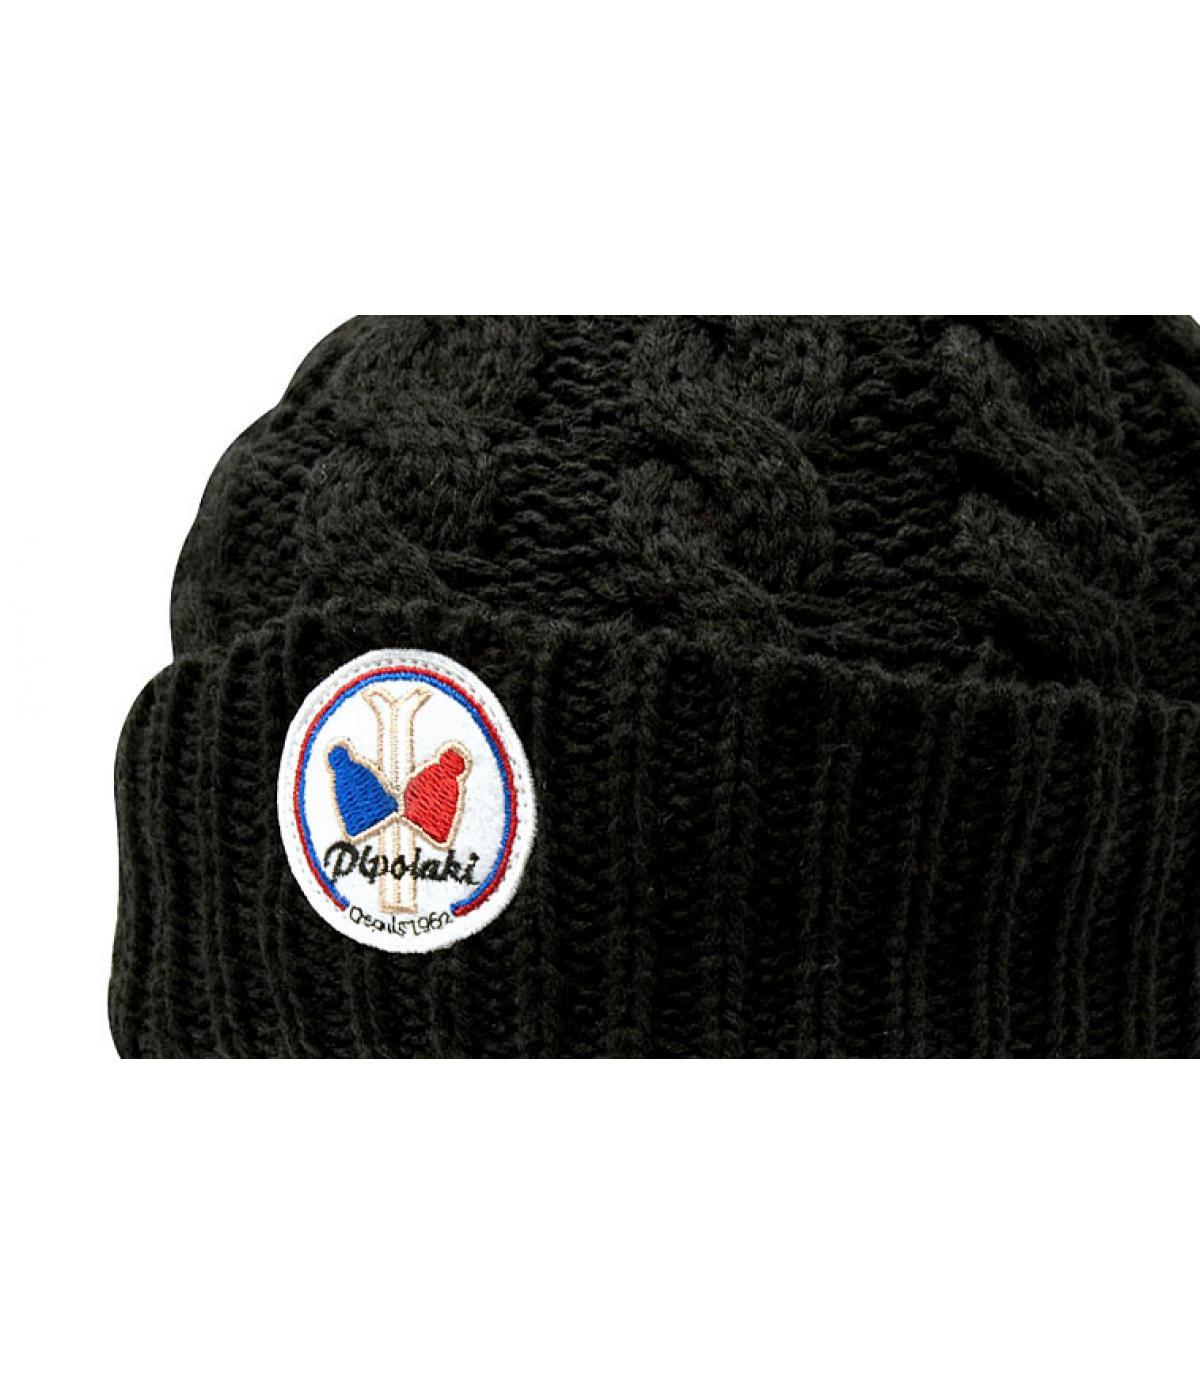 Bonnet gstaad noir